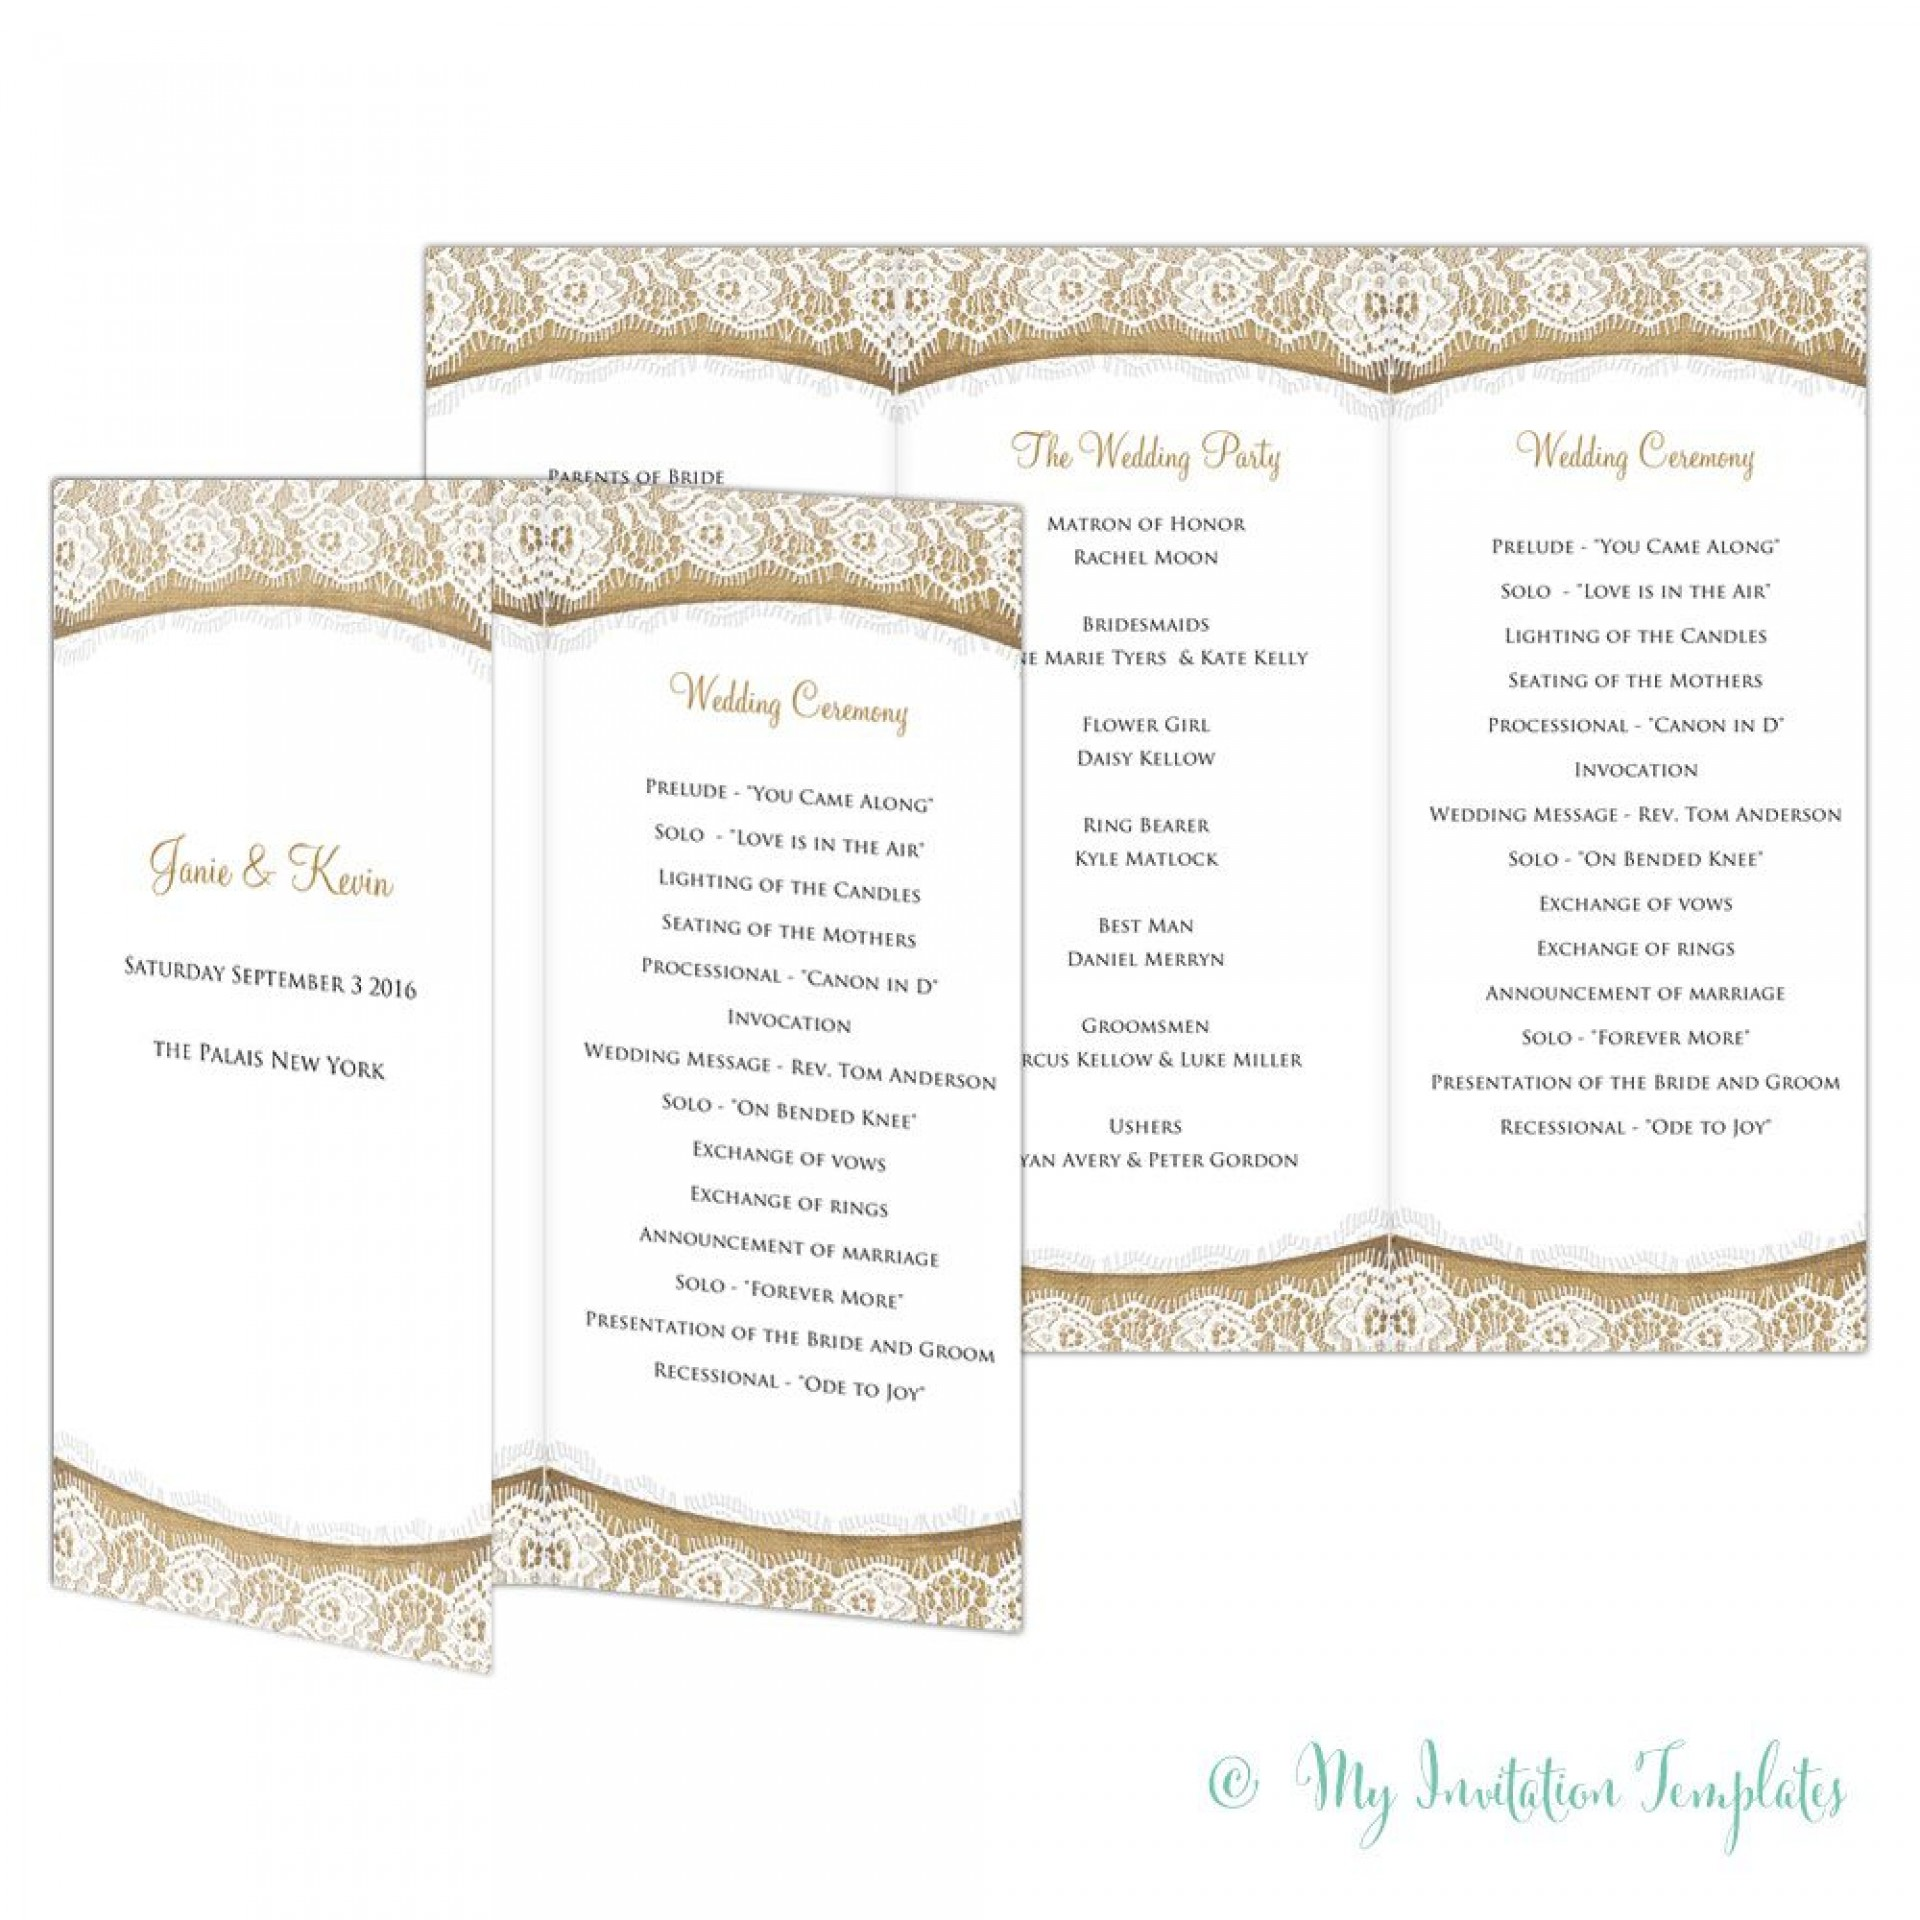 002 Shocking Trifold Wedding Program Template Idea  Templates Tri Fold Tri-fold Publisher Free Foldable1920